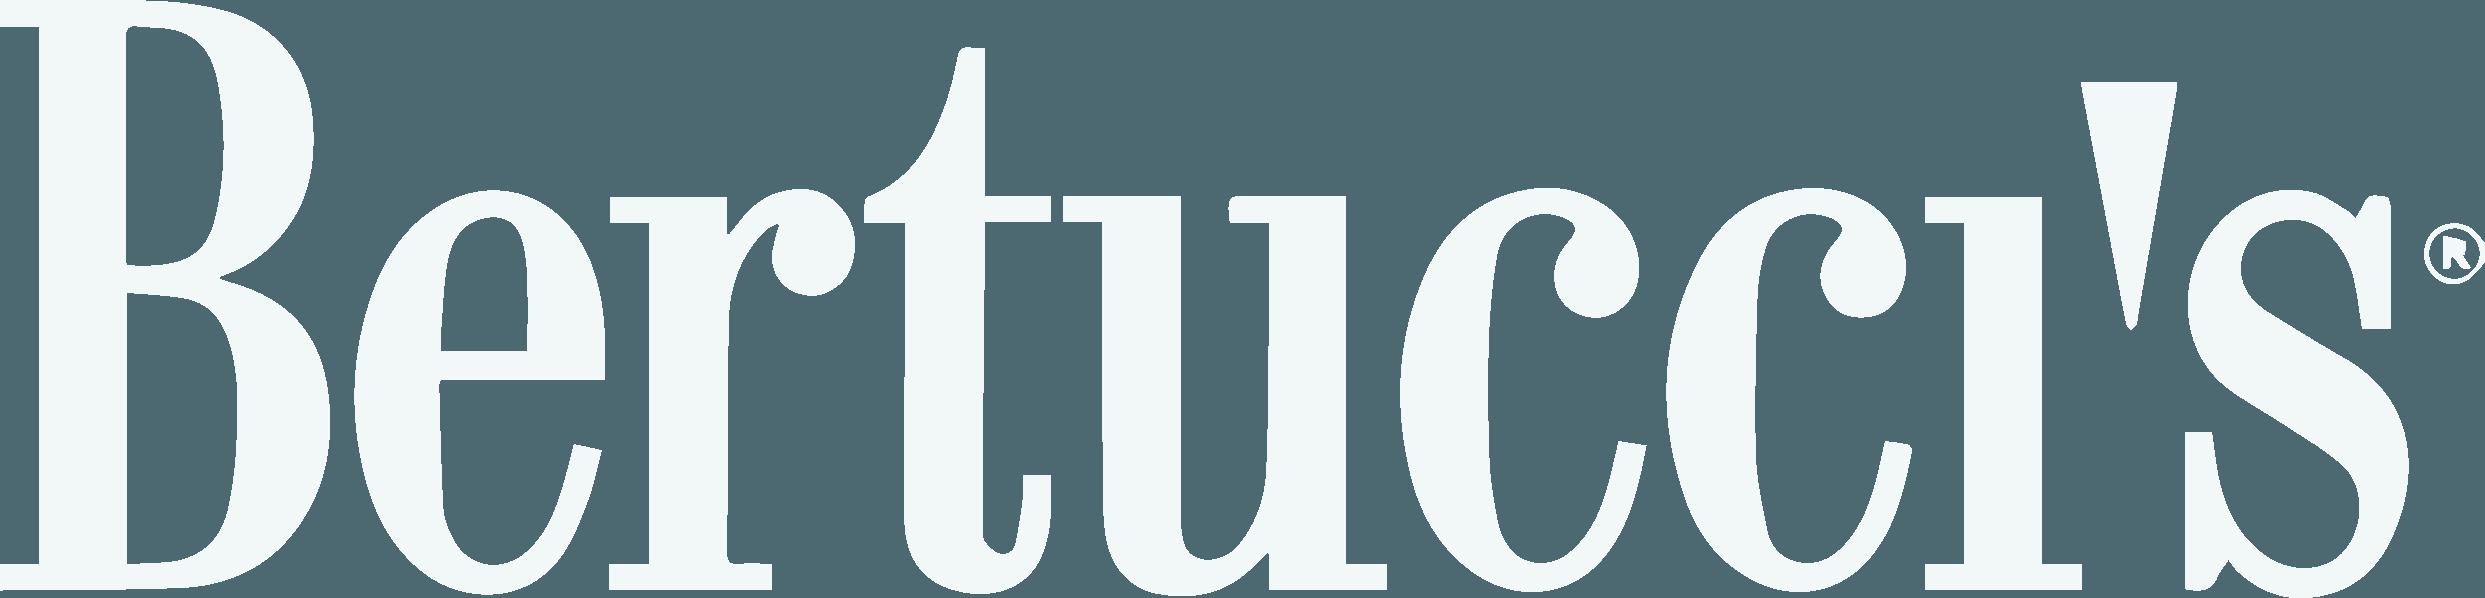 Bertucci's